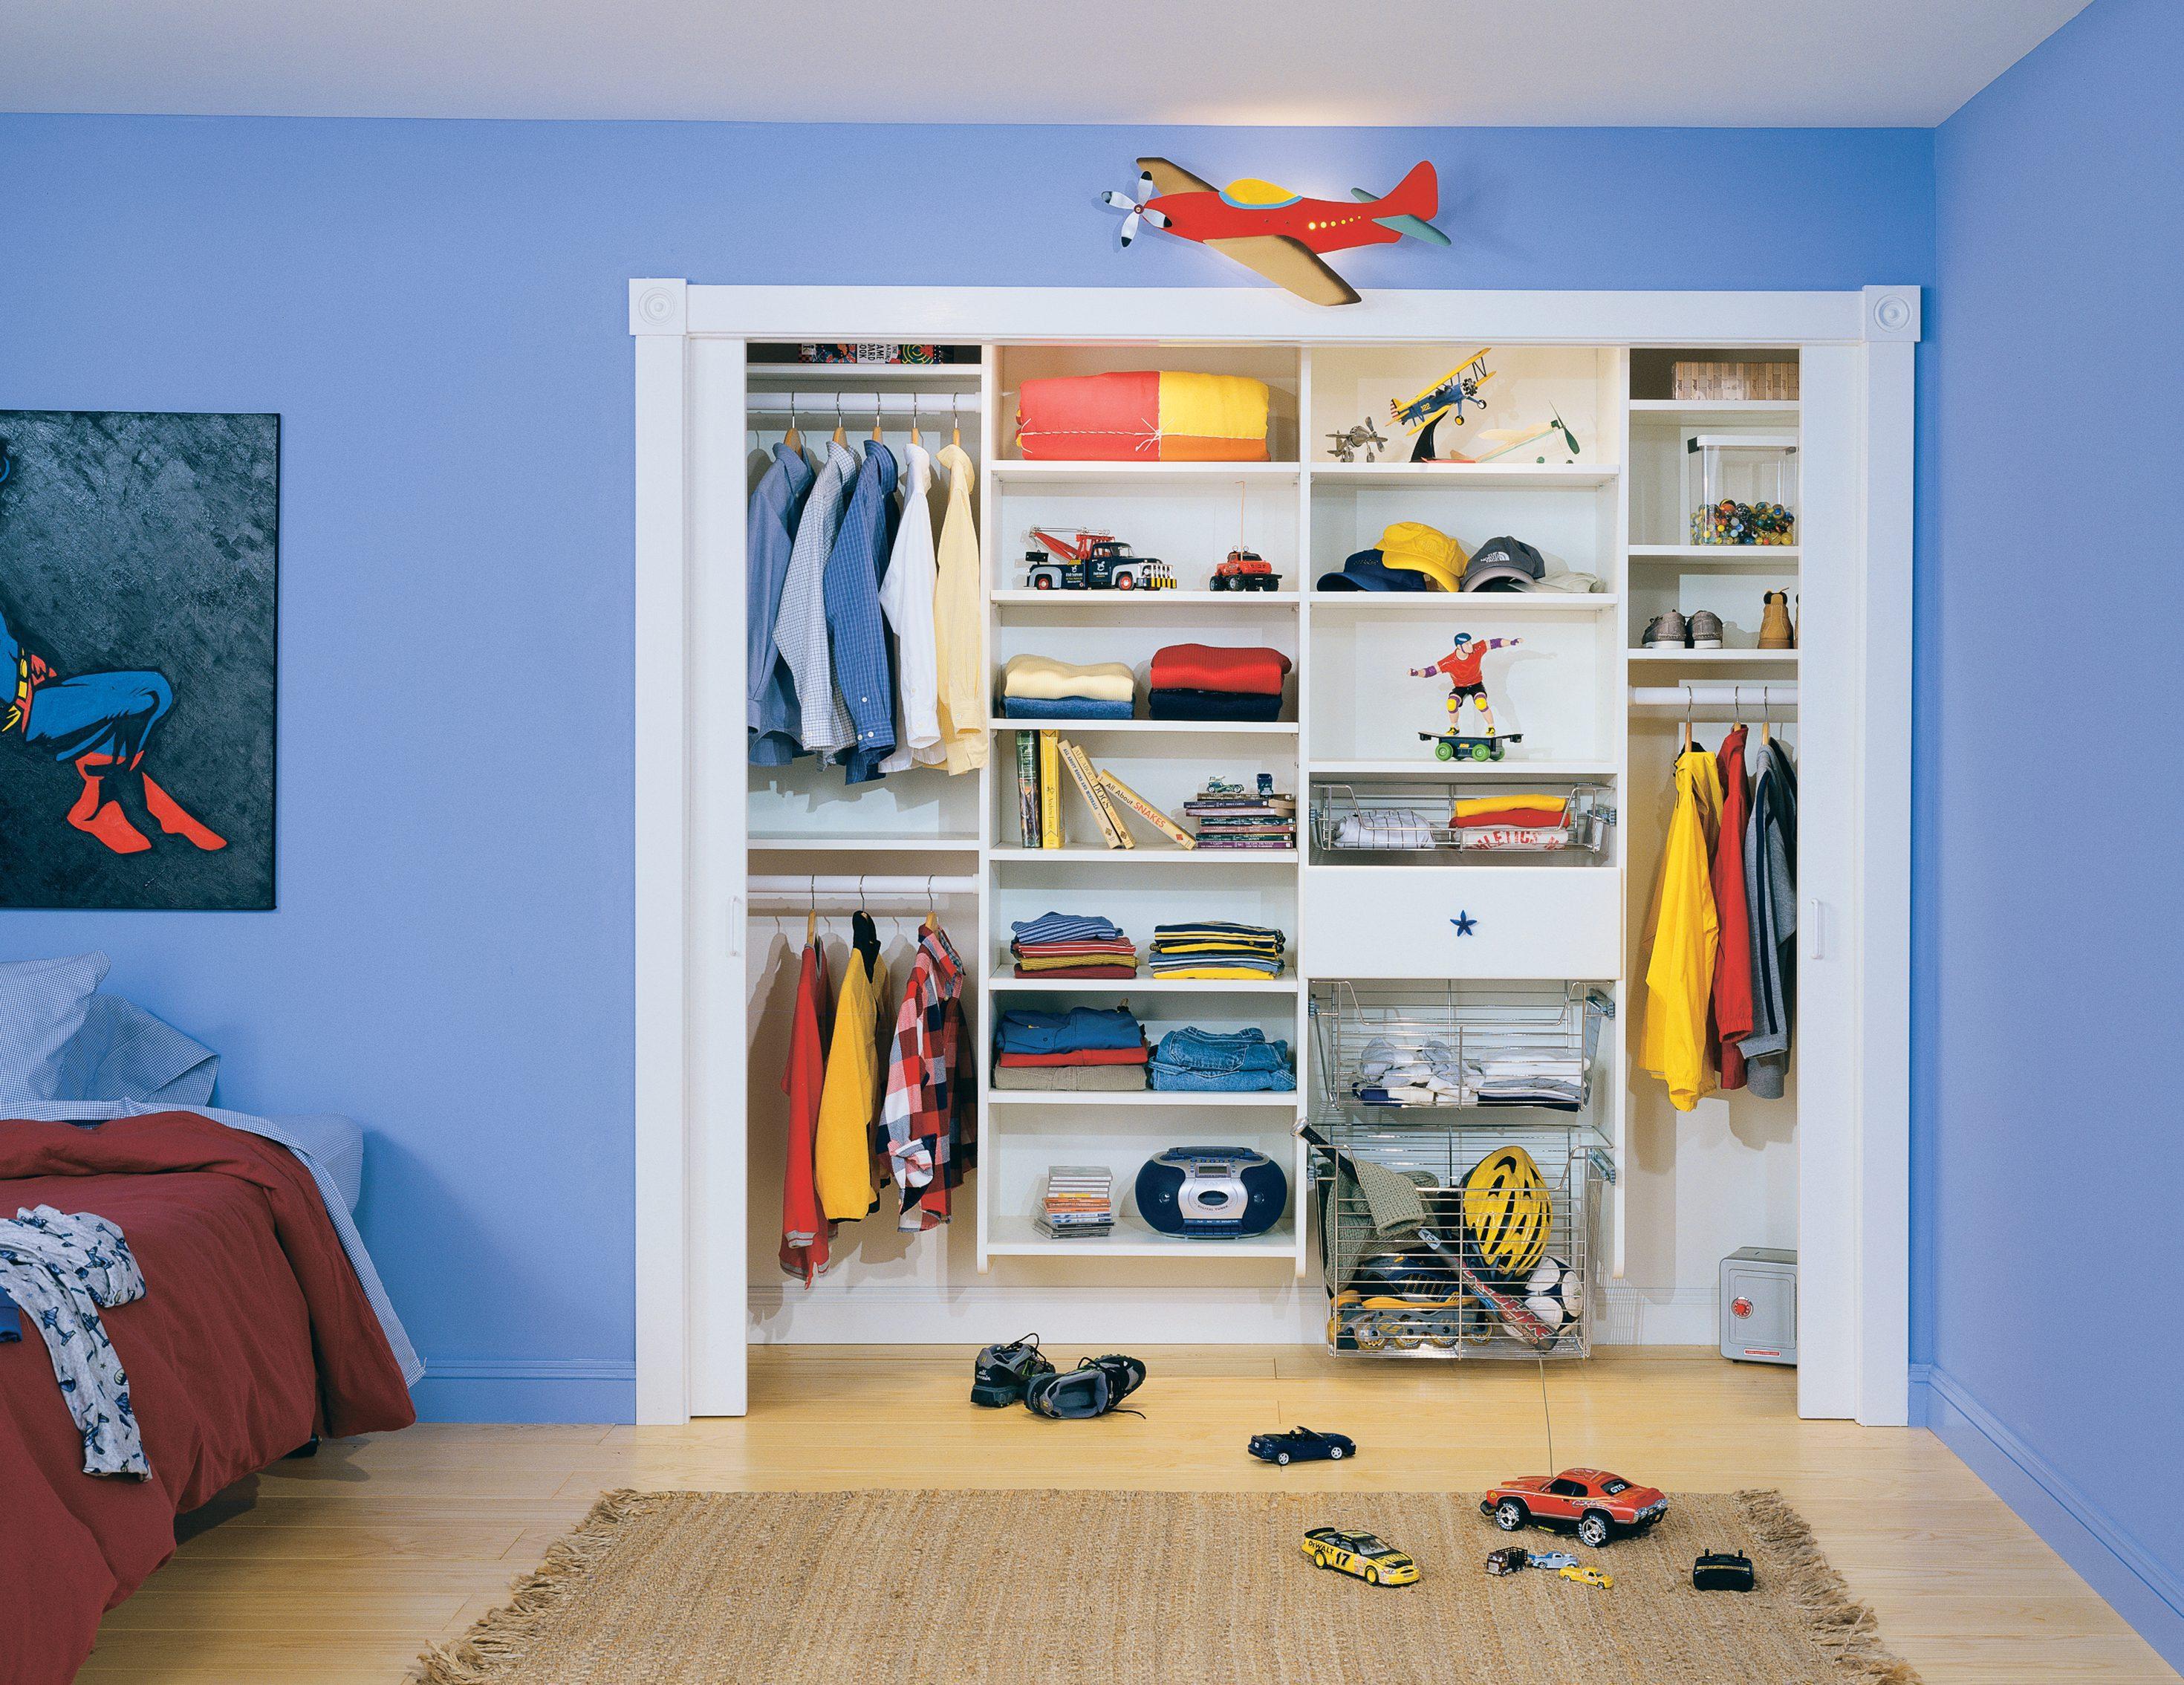 Clóset para Niños/Adolescentes - California Closets